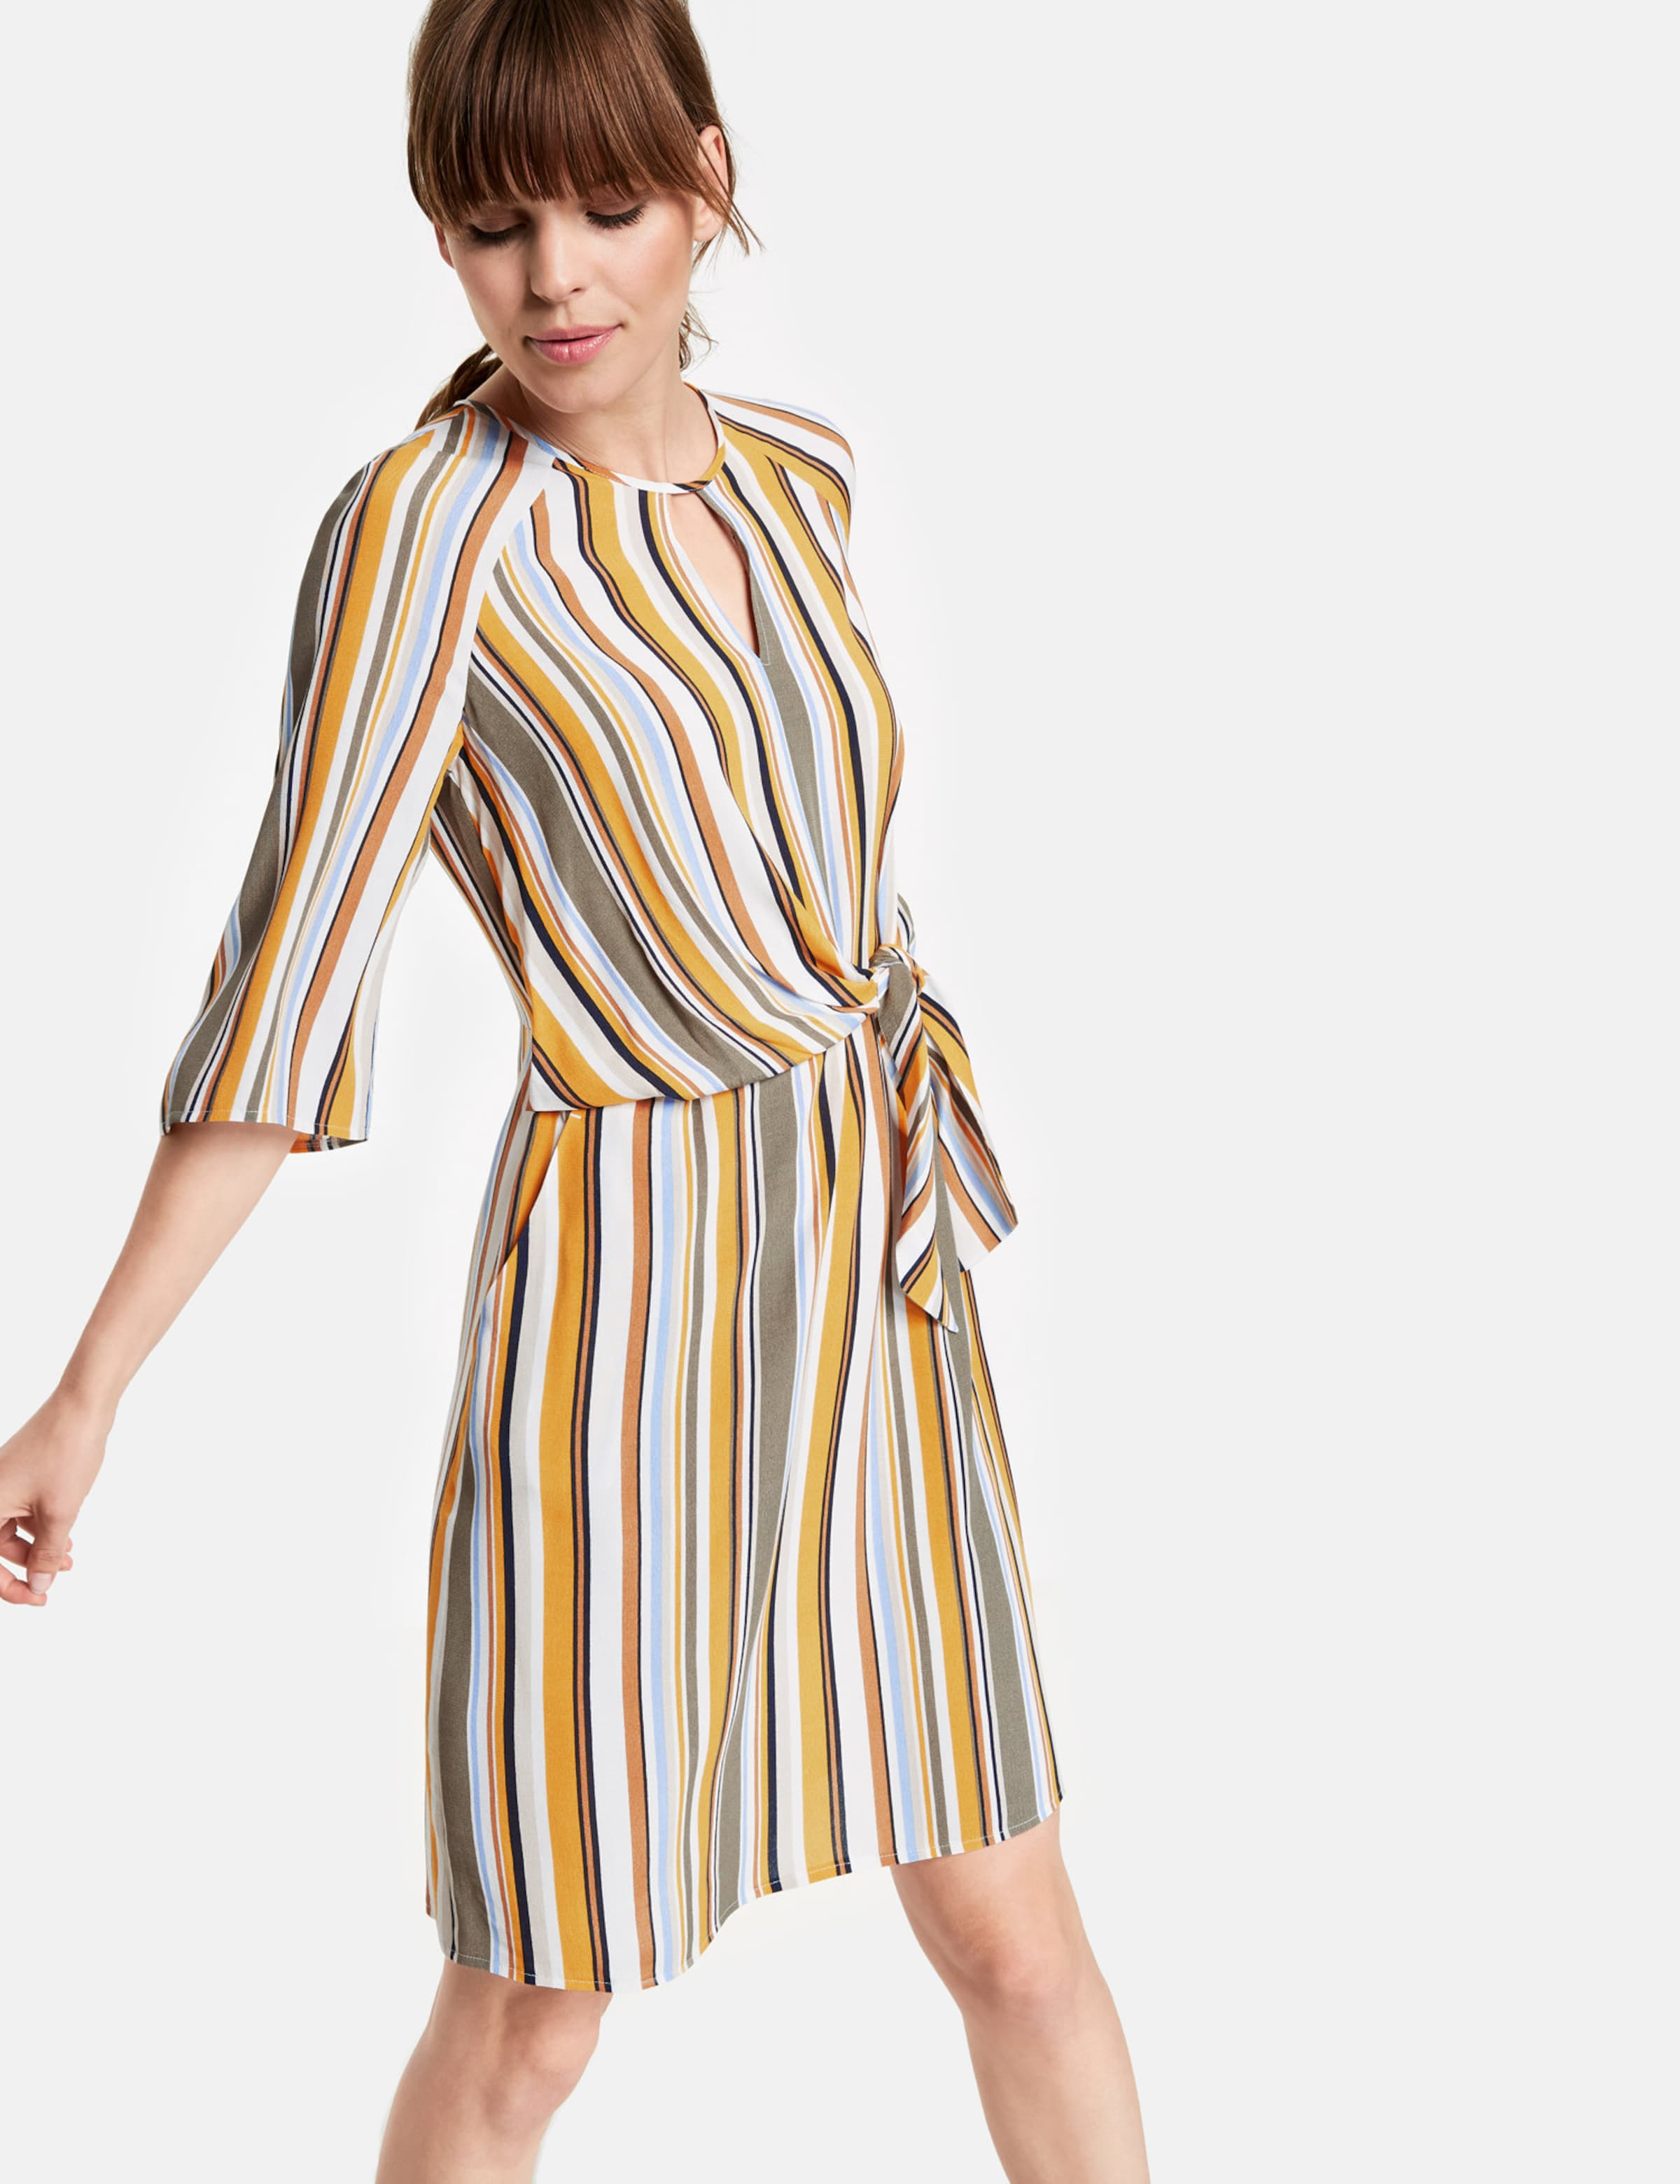 Kleid HellblauCurry Weiß Taifun Orange In NwnkZ0OX8P